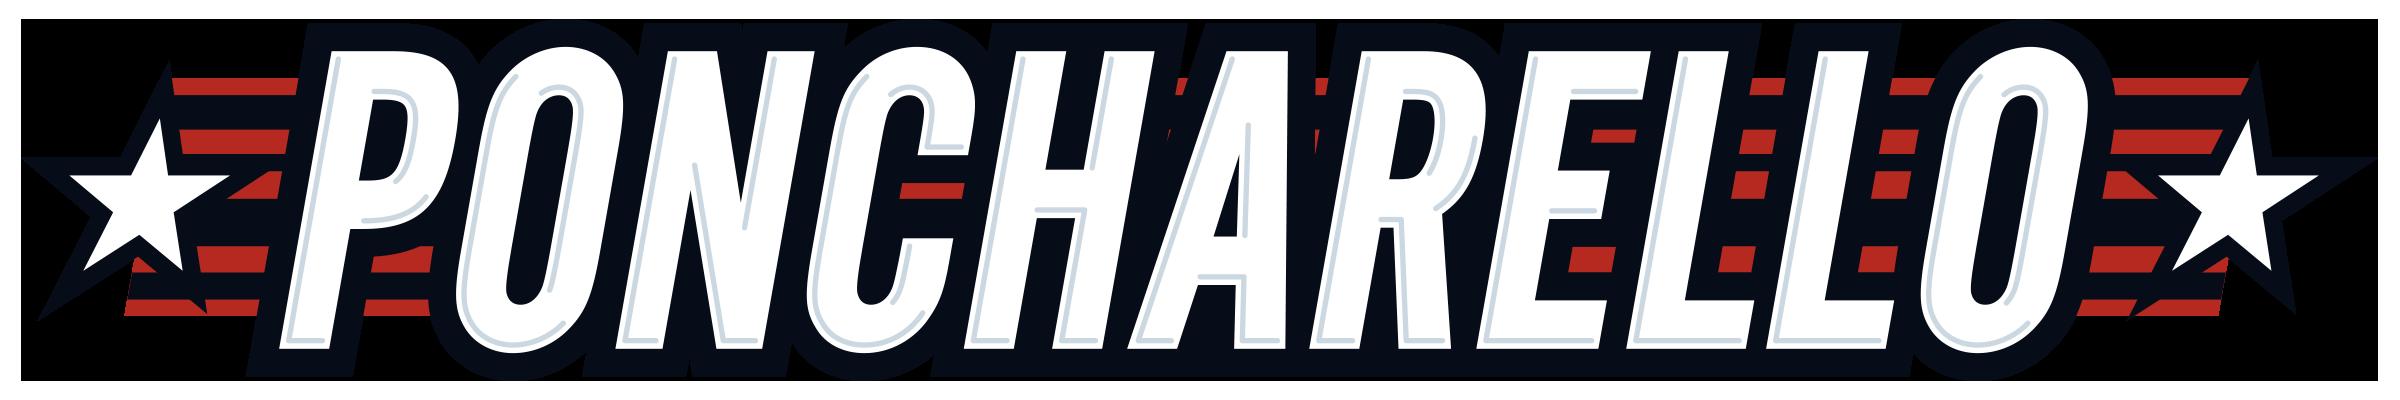 poncharello logo